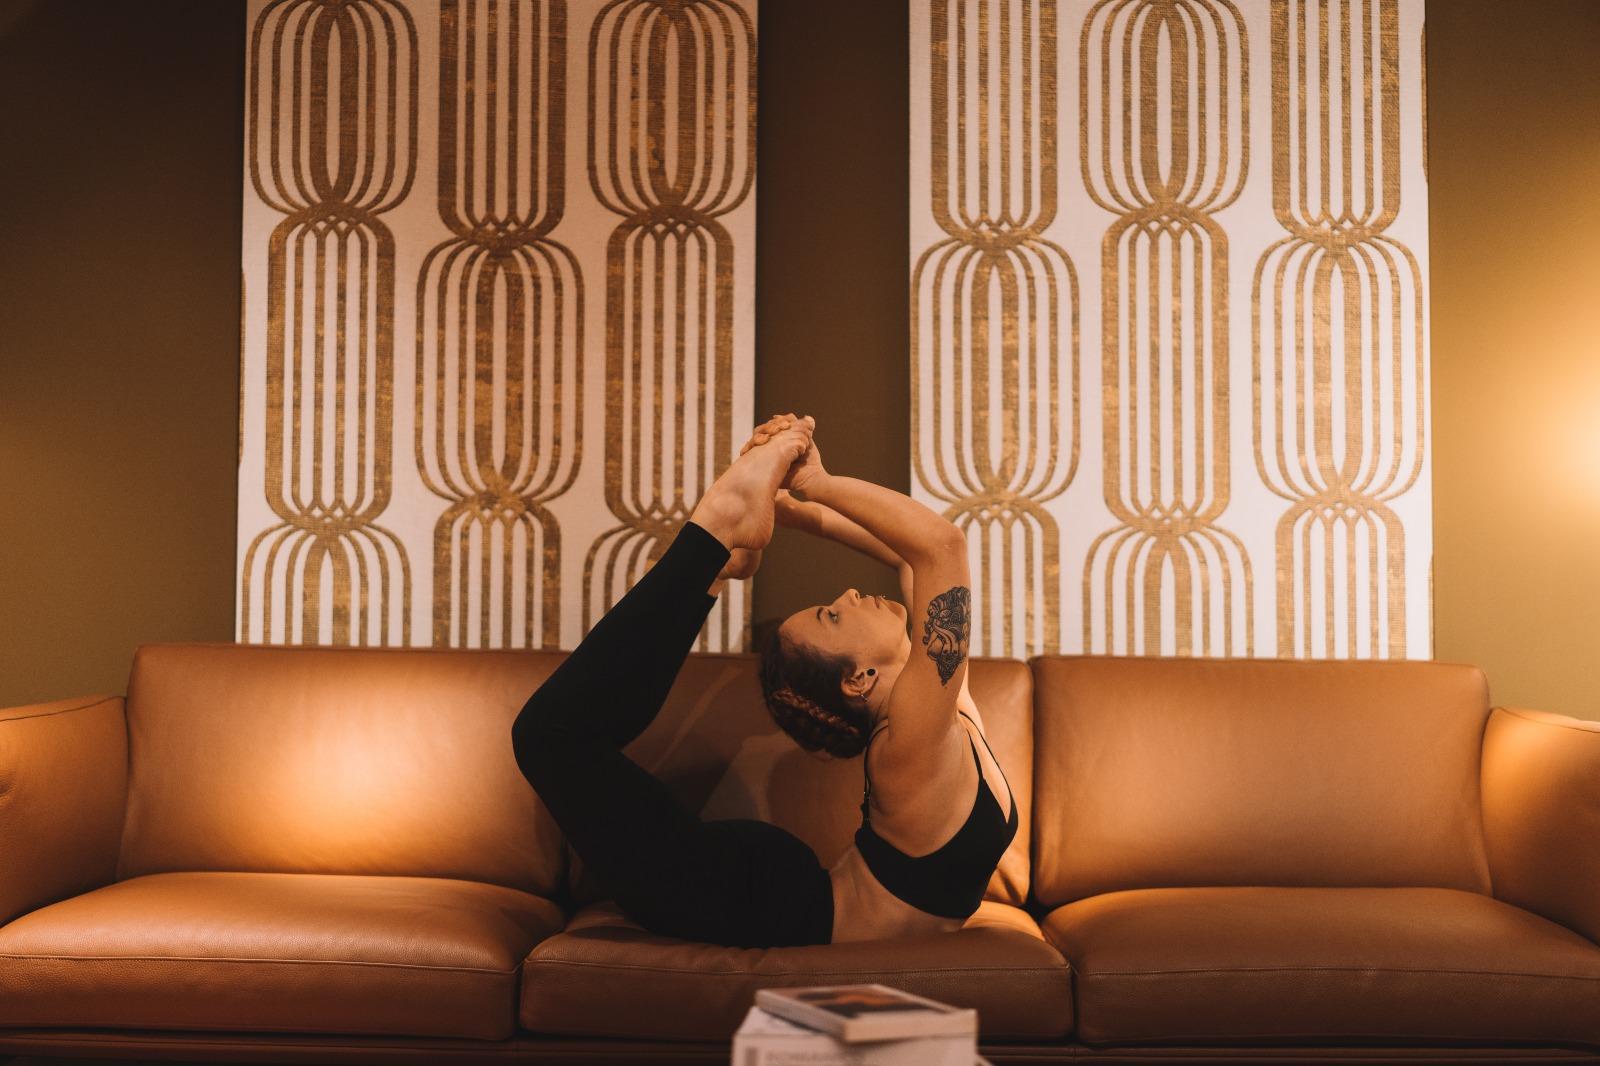 yoga lyon, lyon yoga, tiny yoga club, tiny yoga lyon, cours de yoga lyon, cours yoga lyon, yoga prénatal lyon, ivanka moisan, ivanka yoga lyon, ashtanga yoga